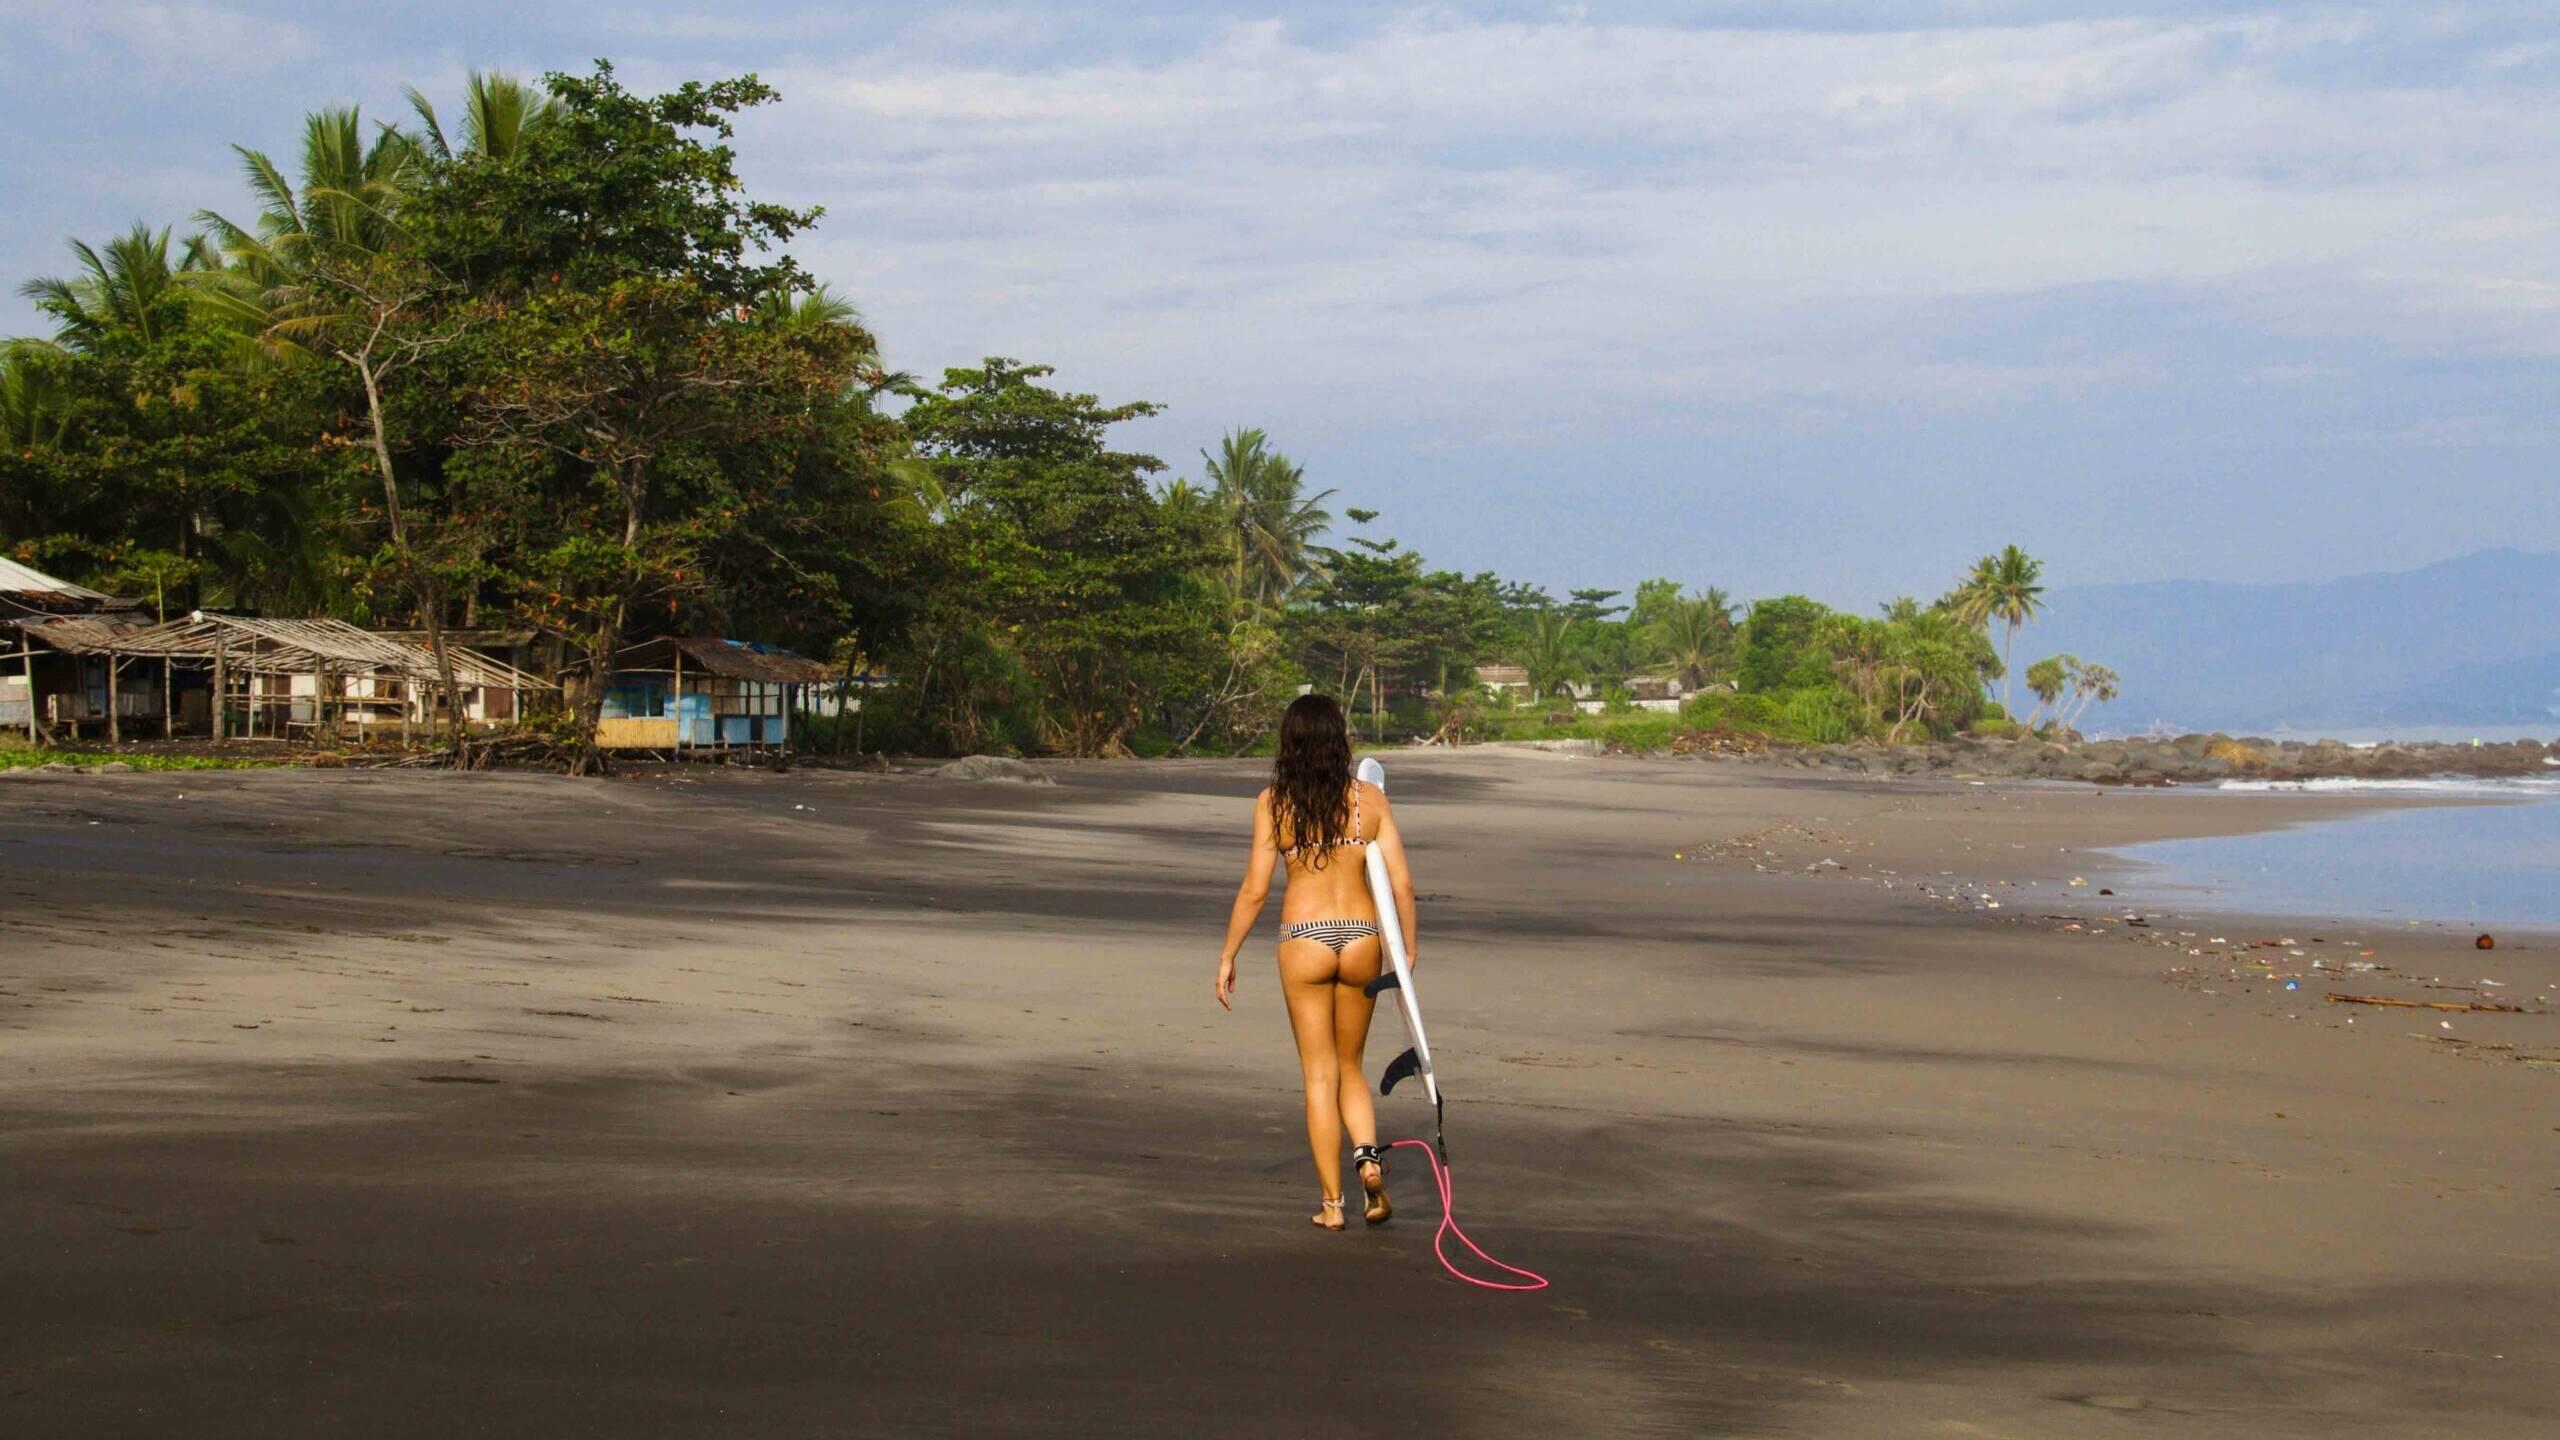 Surfer girl on Cimaja beach Java